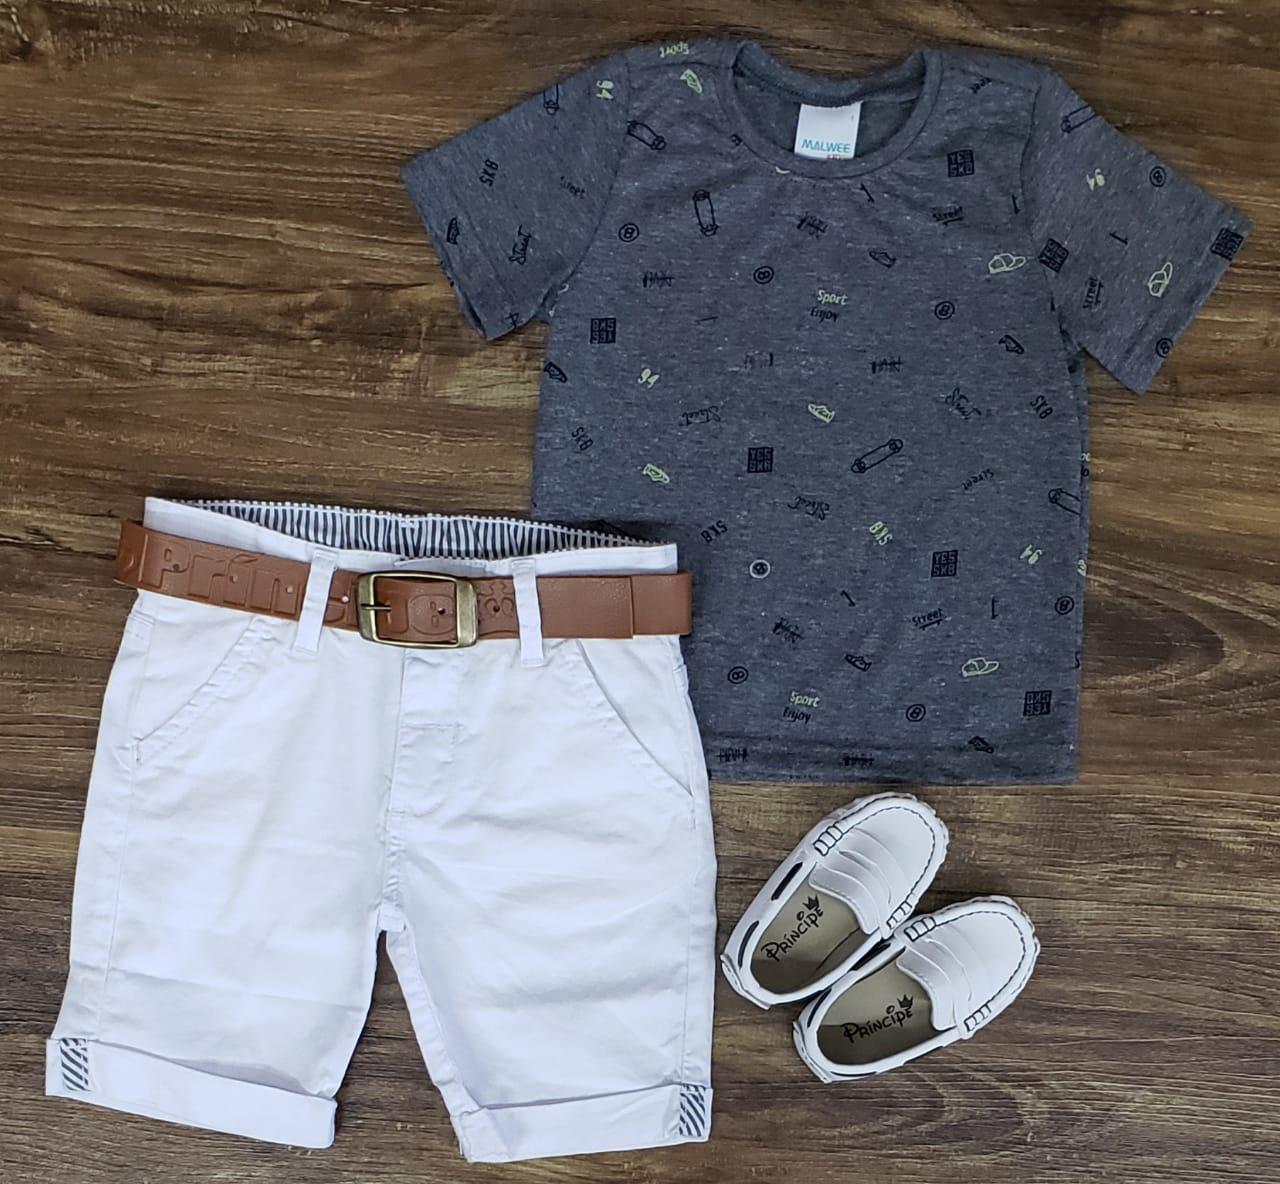 Bermuda Branca com Camiseta Cinza